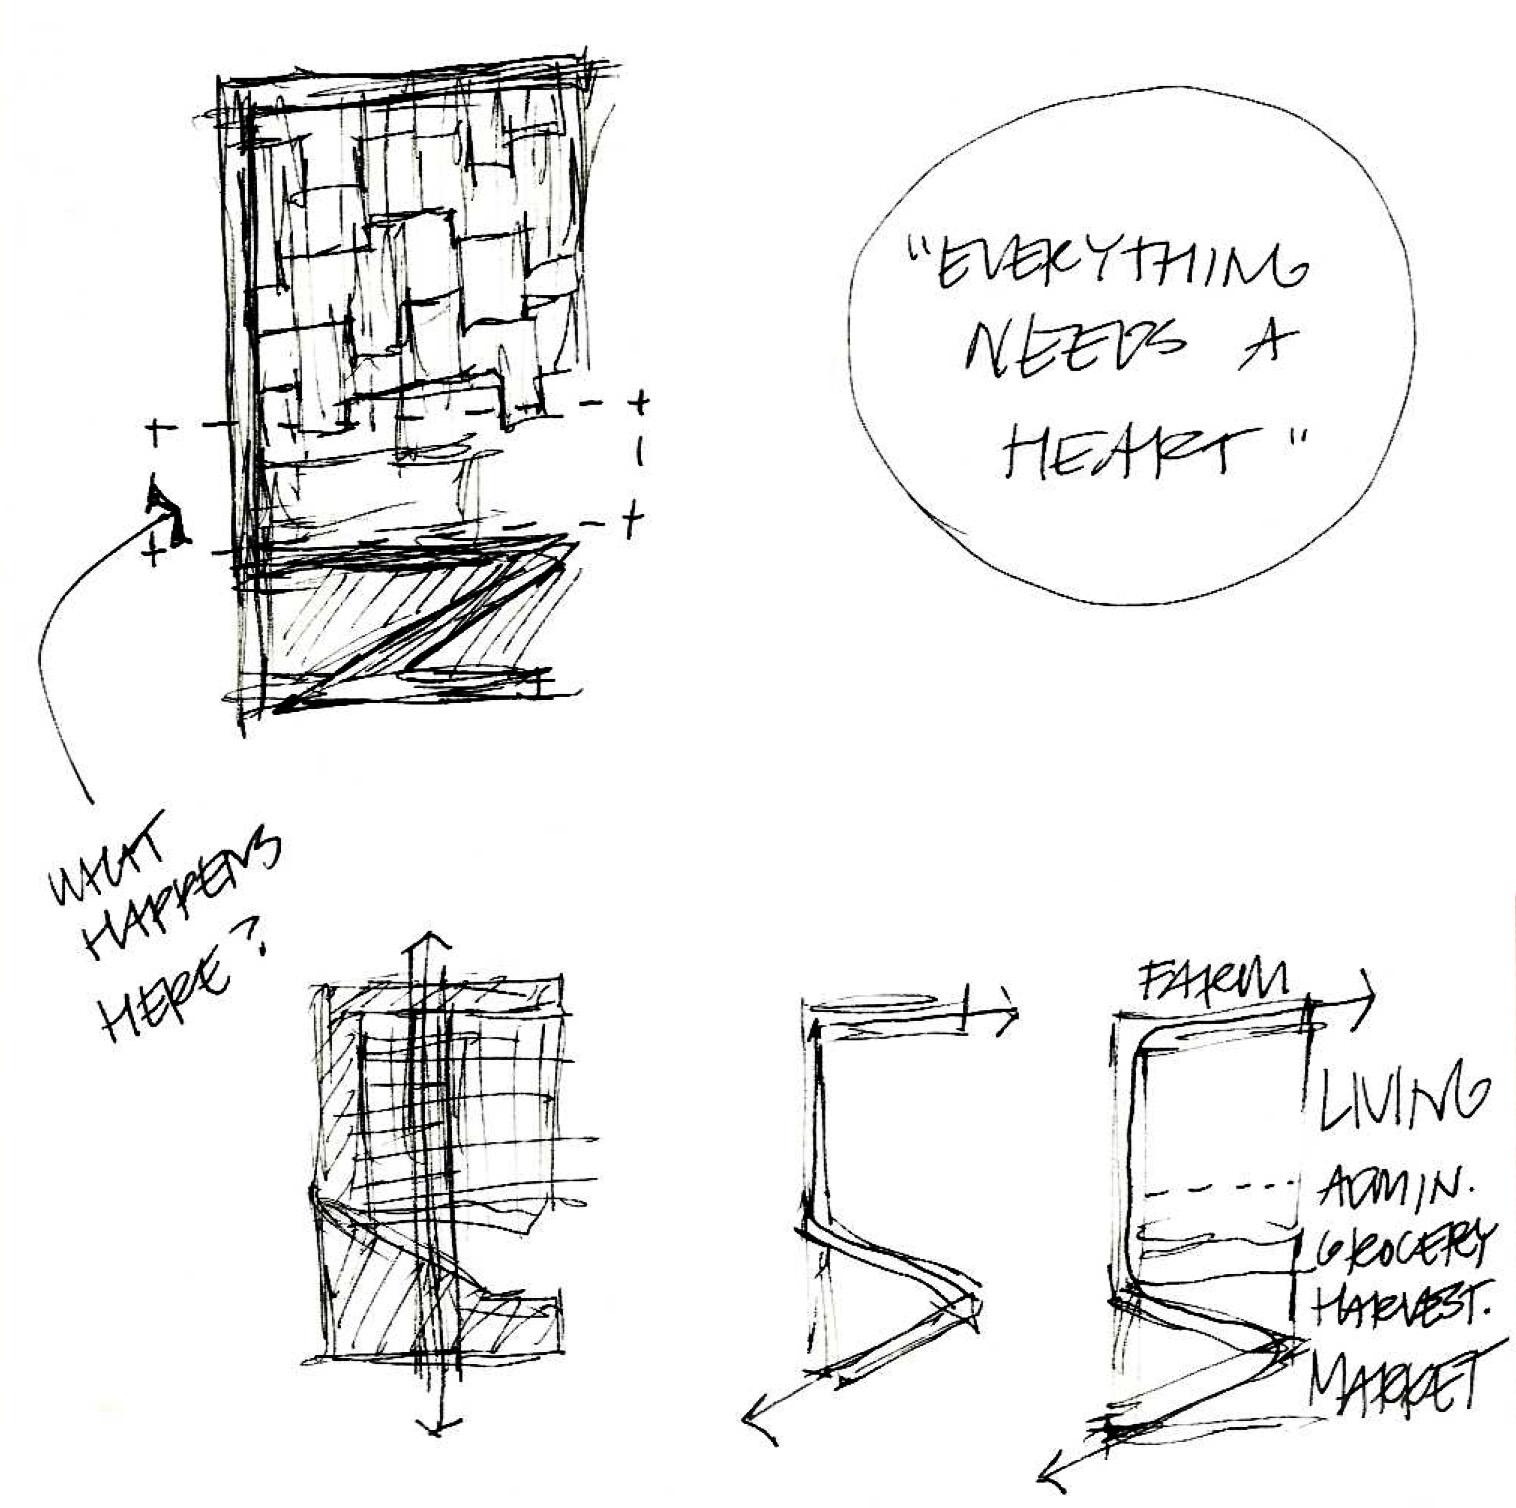 seattle sketch 2.jpg